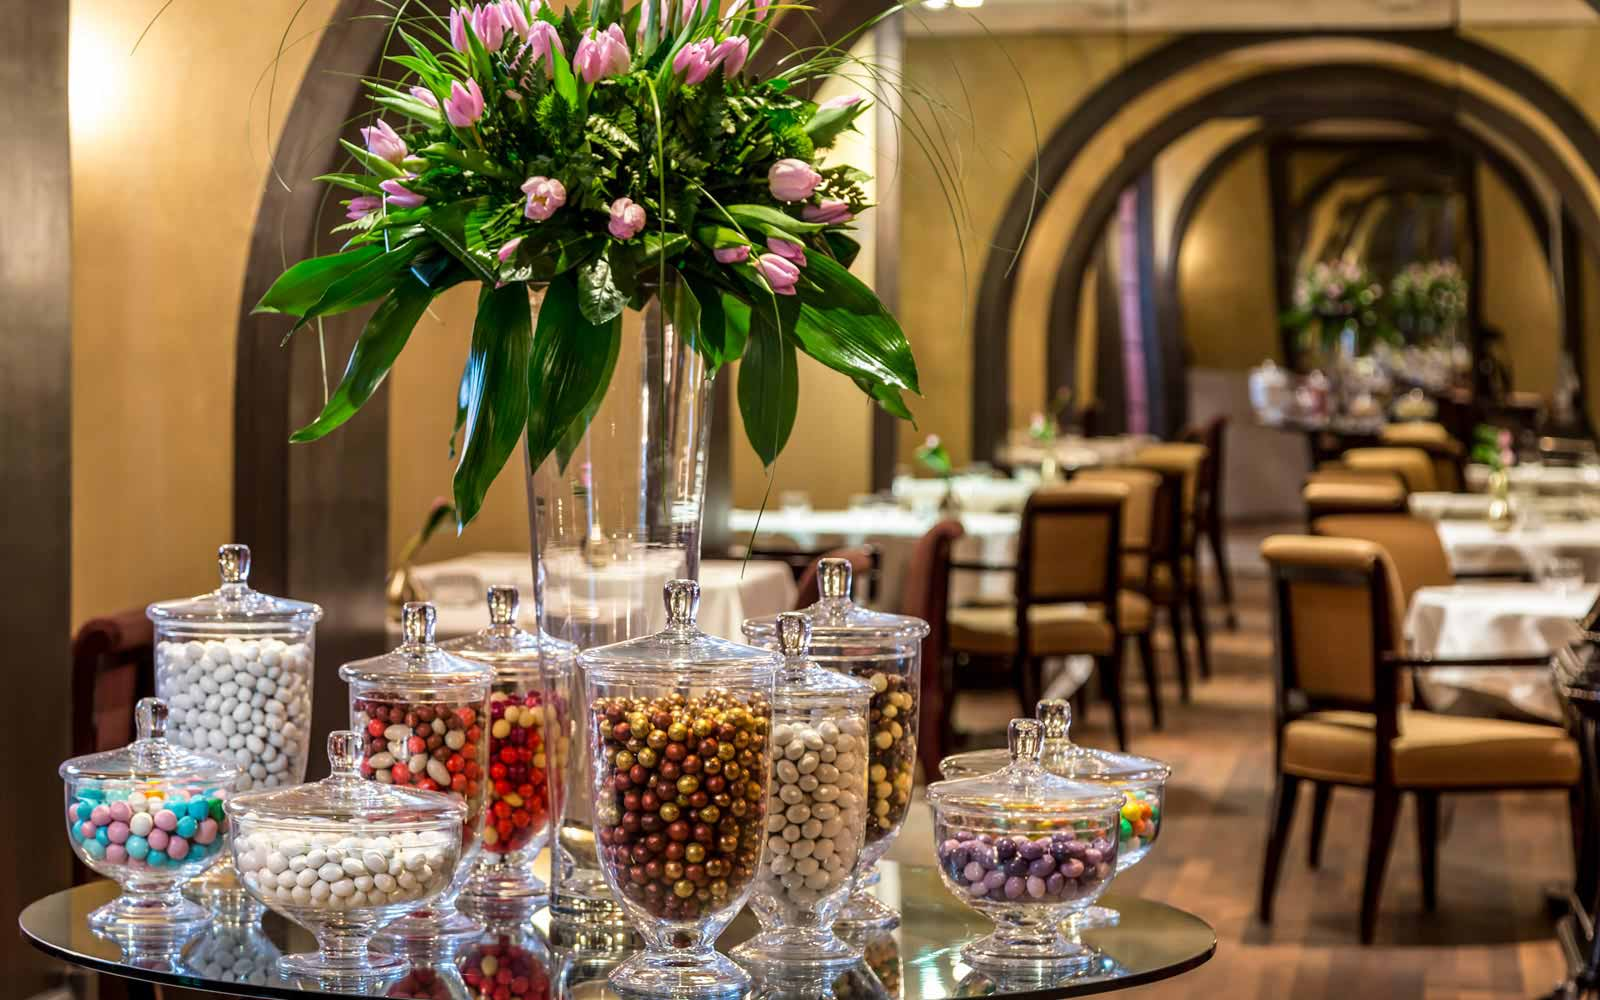 Interiors at the Grand Hotel Via Veneto